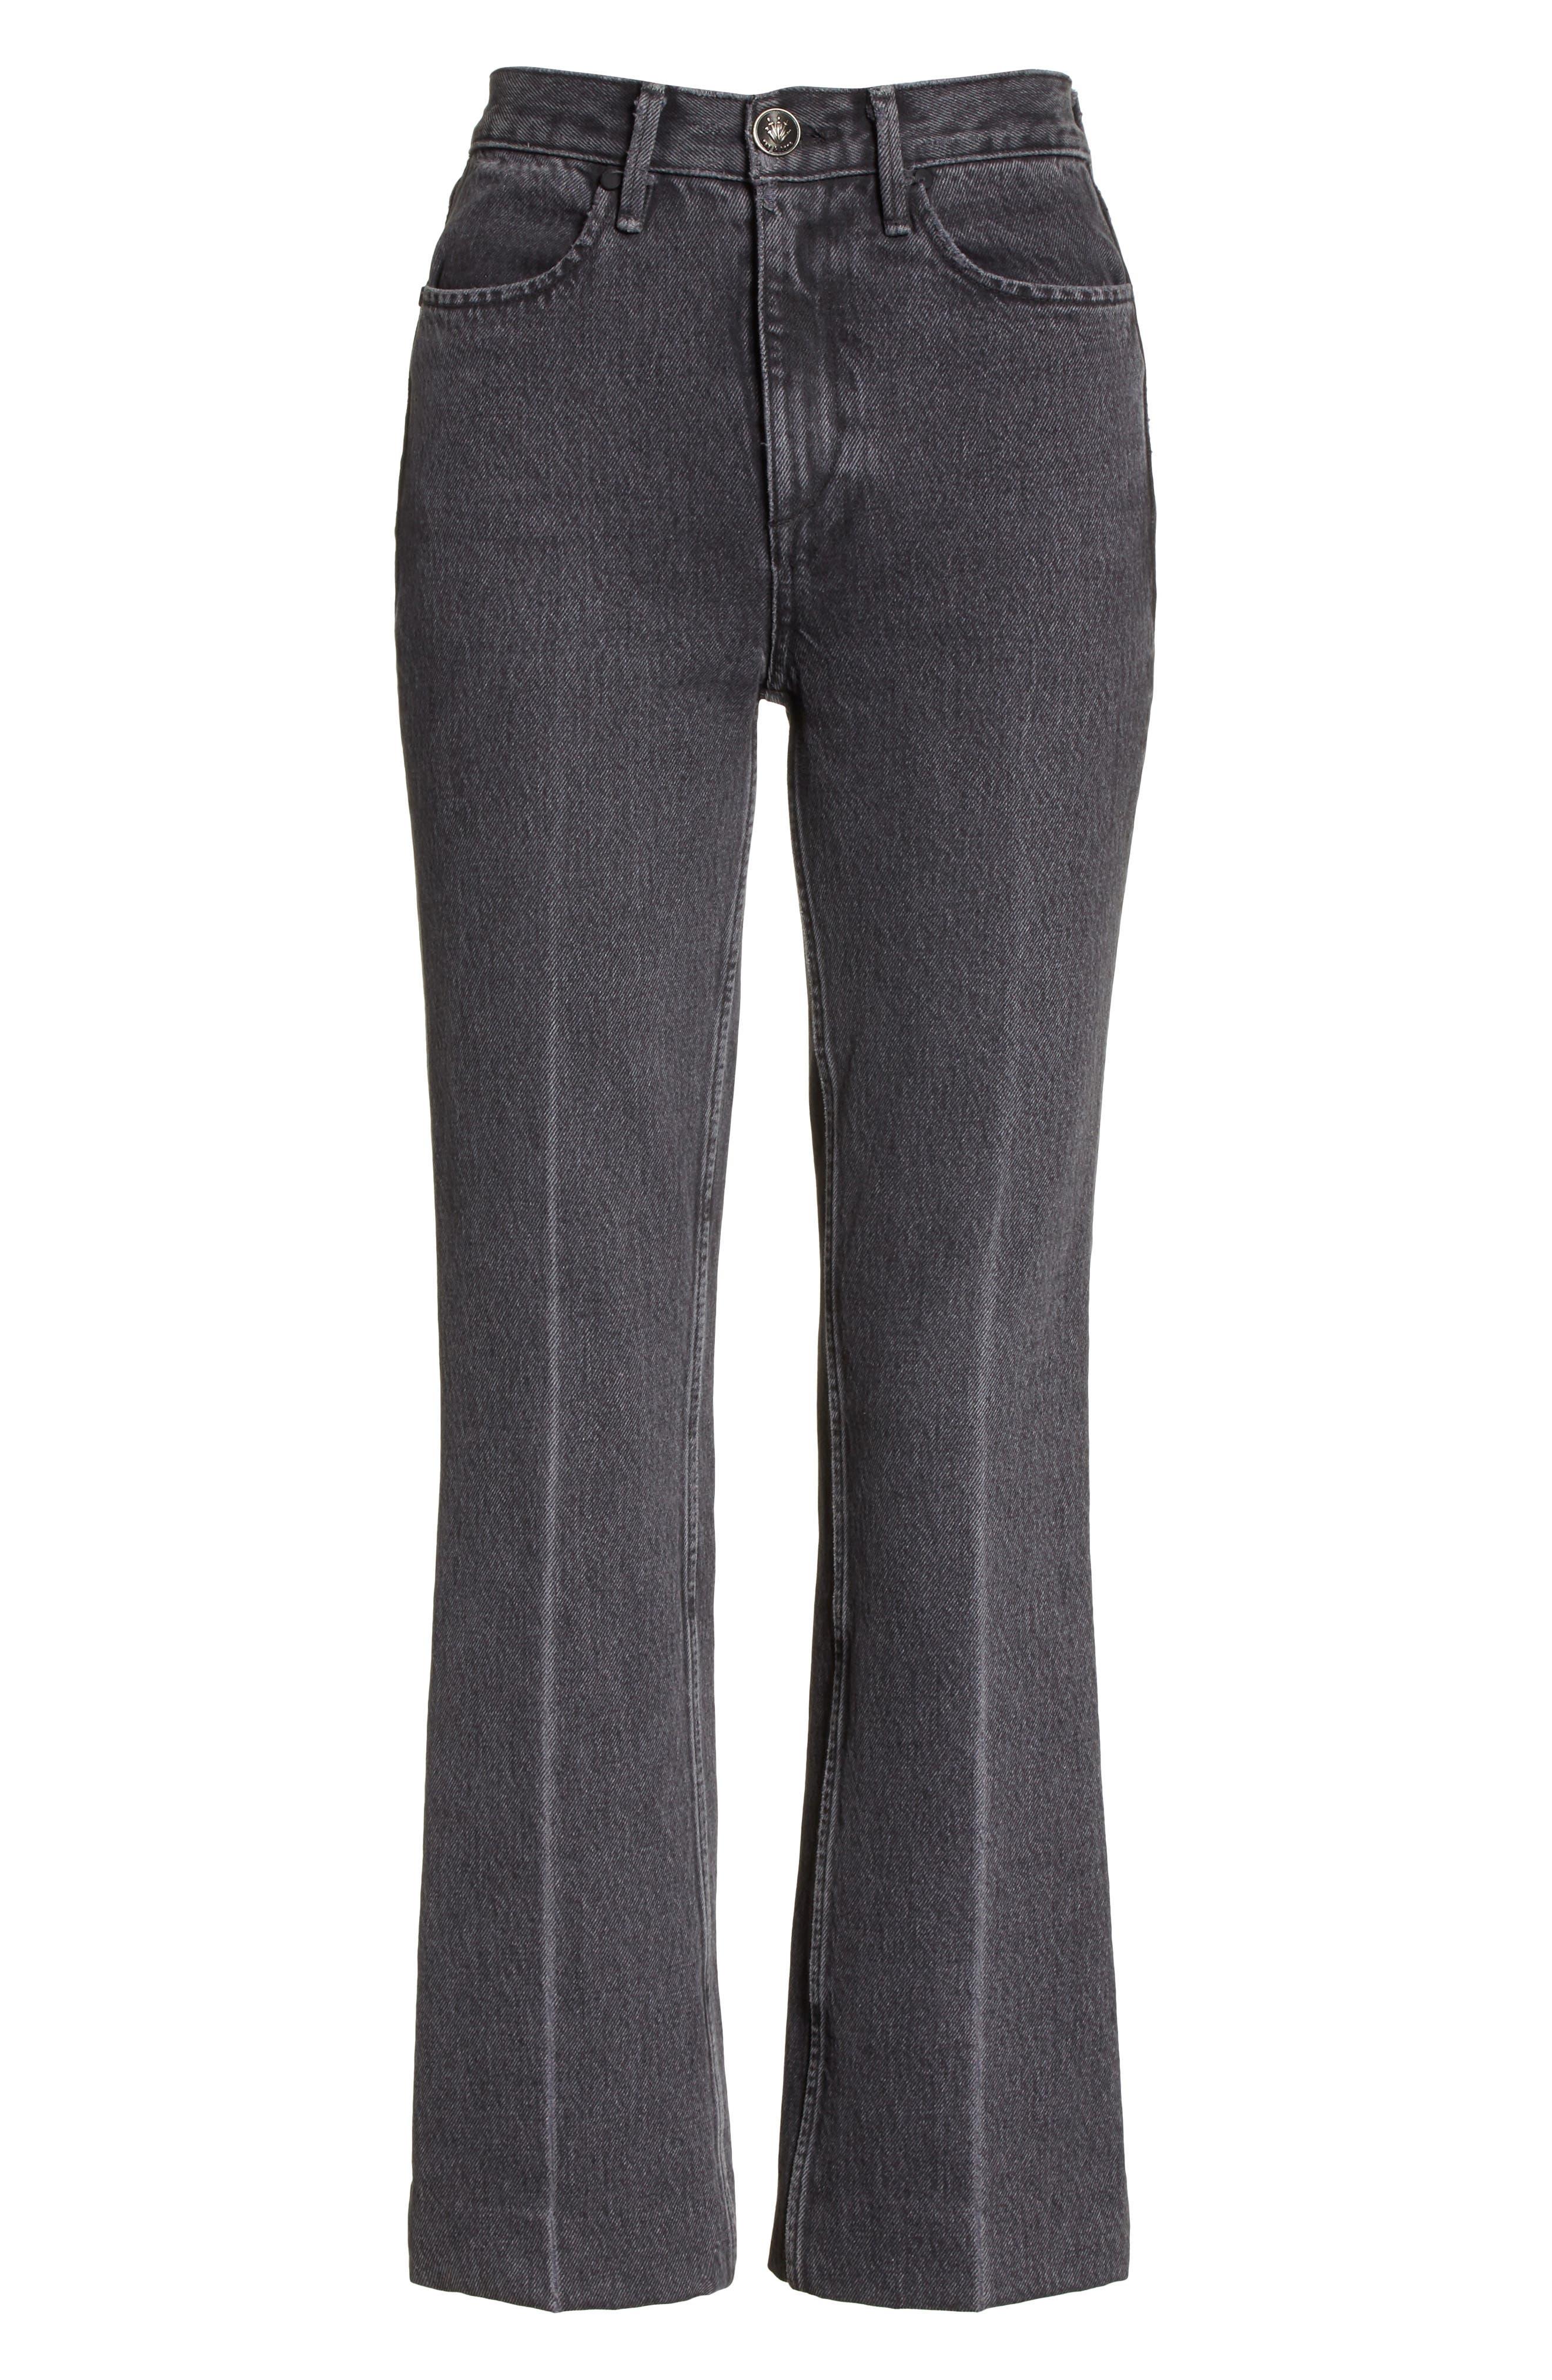 Dylan High Waist Crop Kick Flare Jeans,                             Alternate thumbnail 6, color,                             021